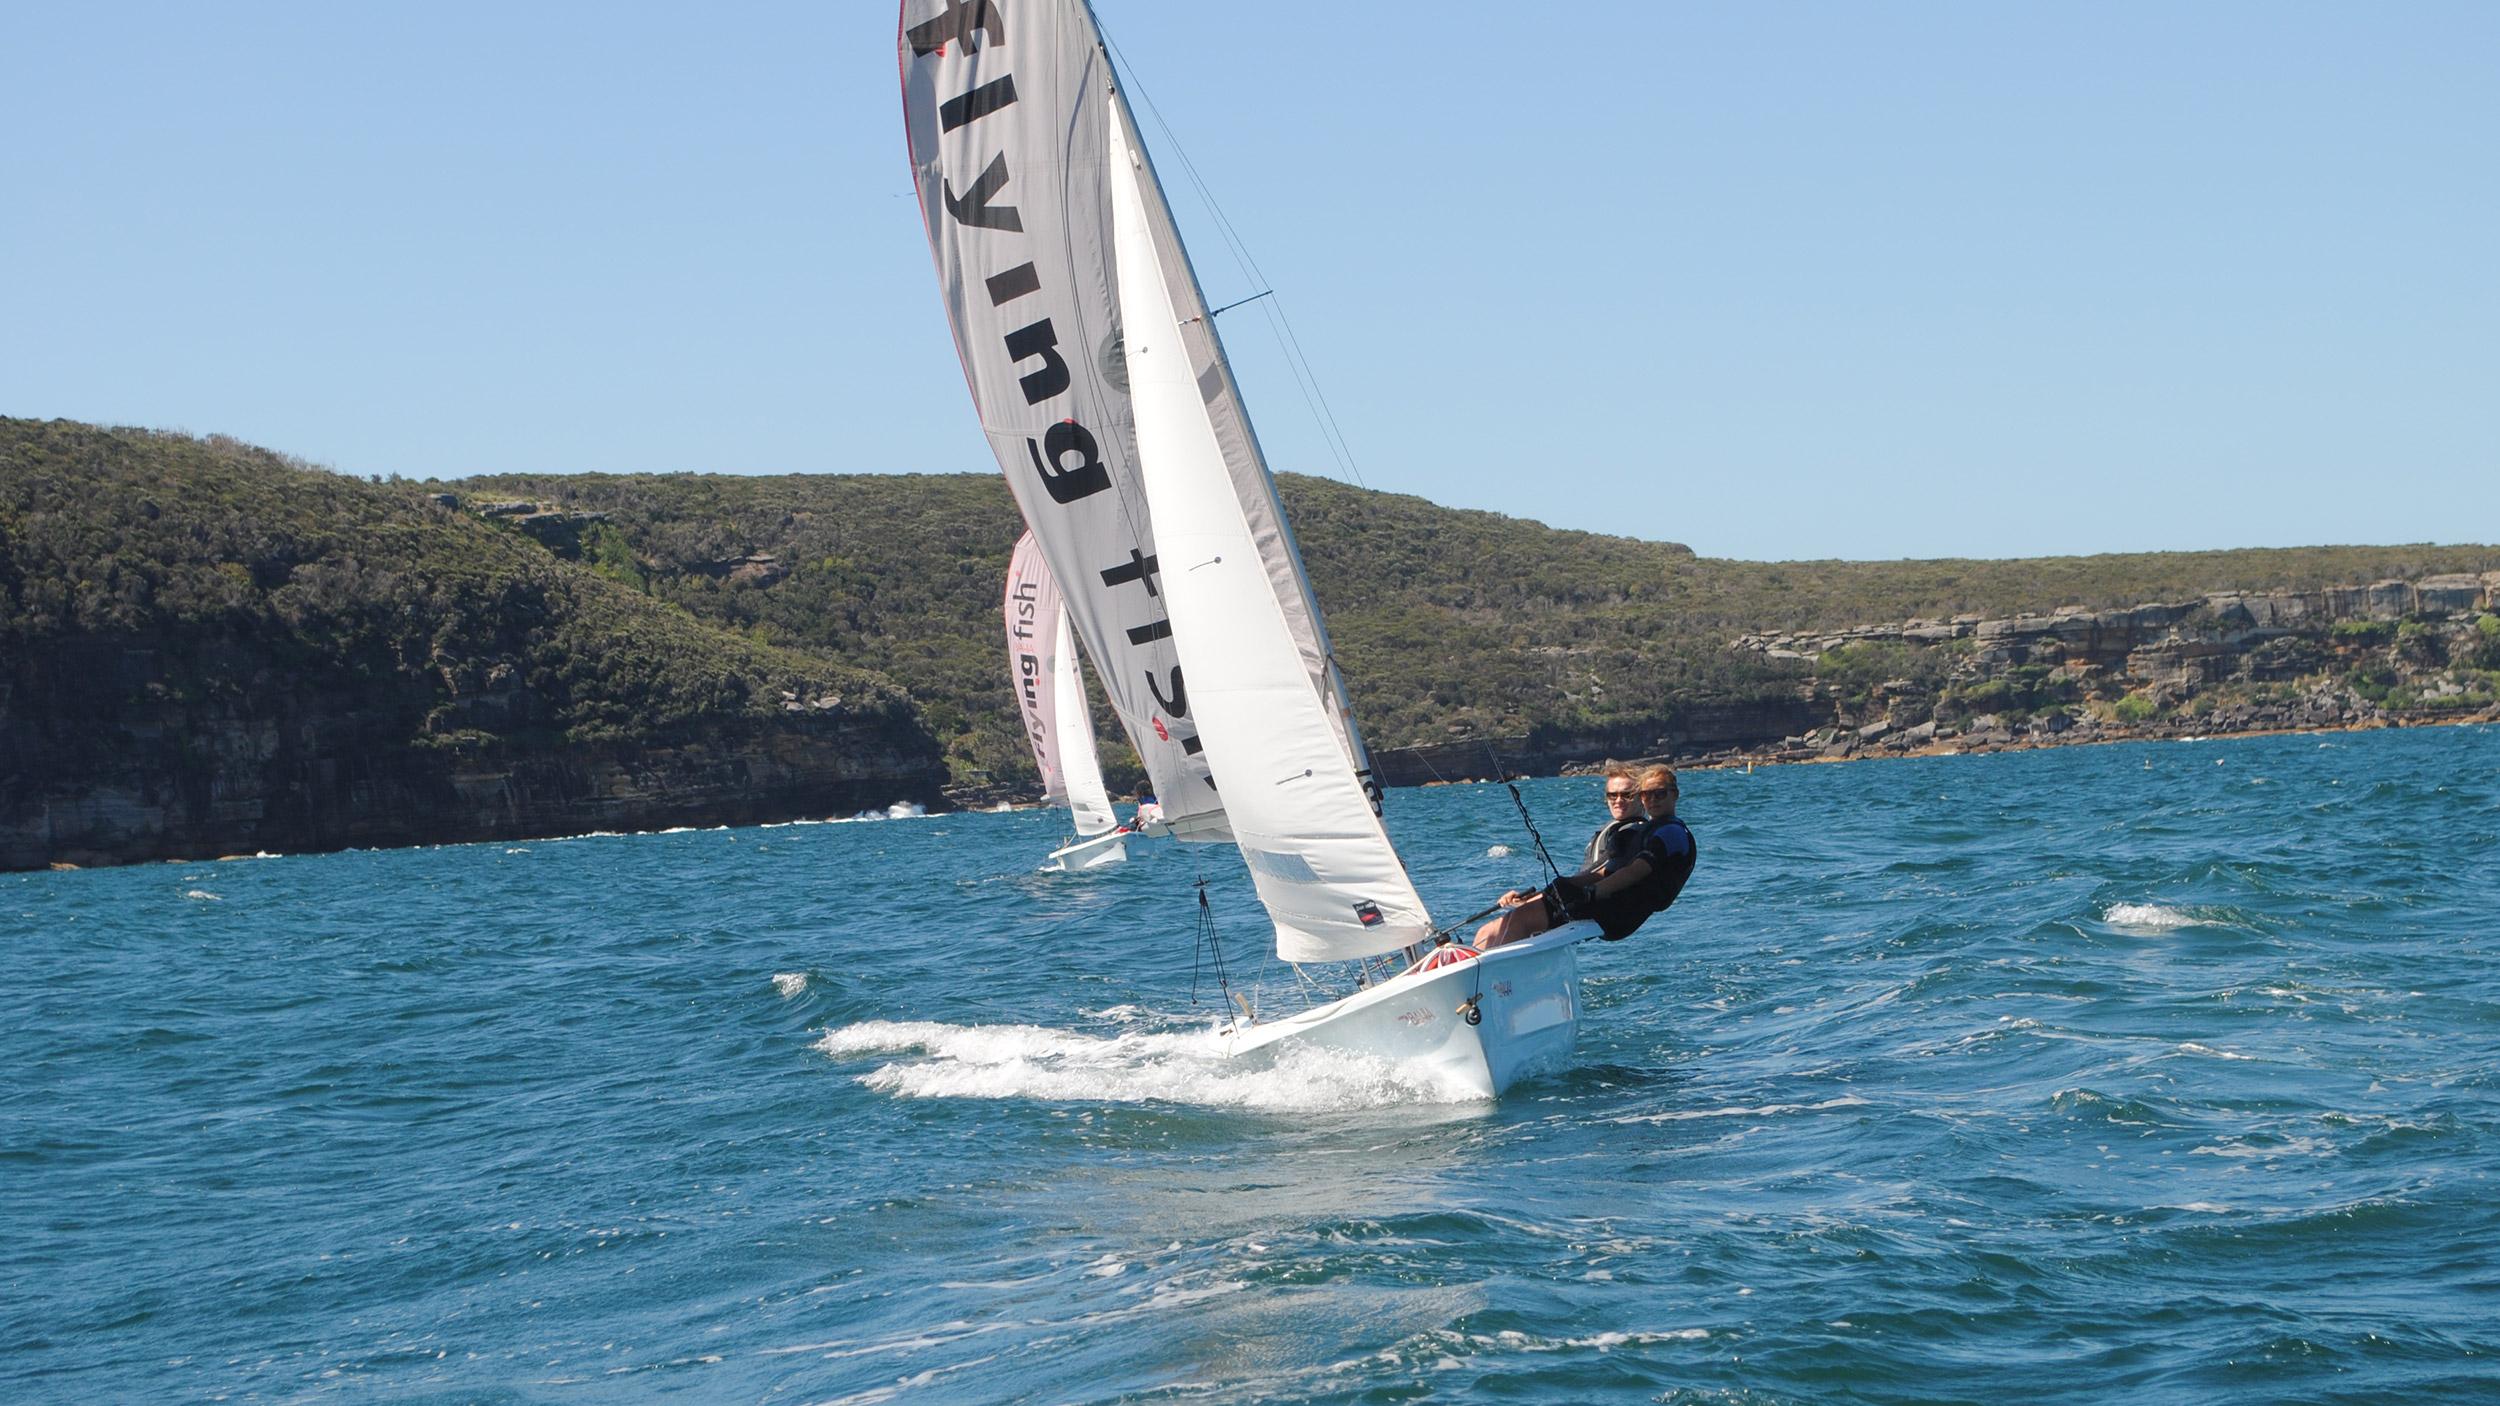 Flying-Fish-Sailing-d2%401.jpg